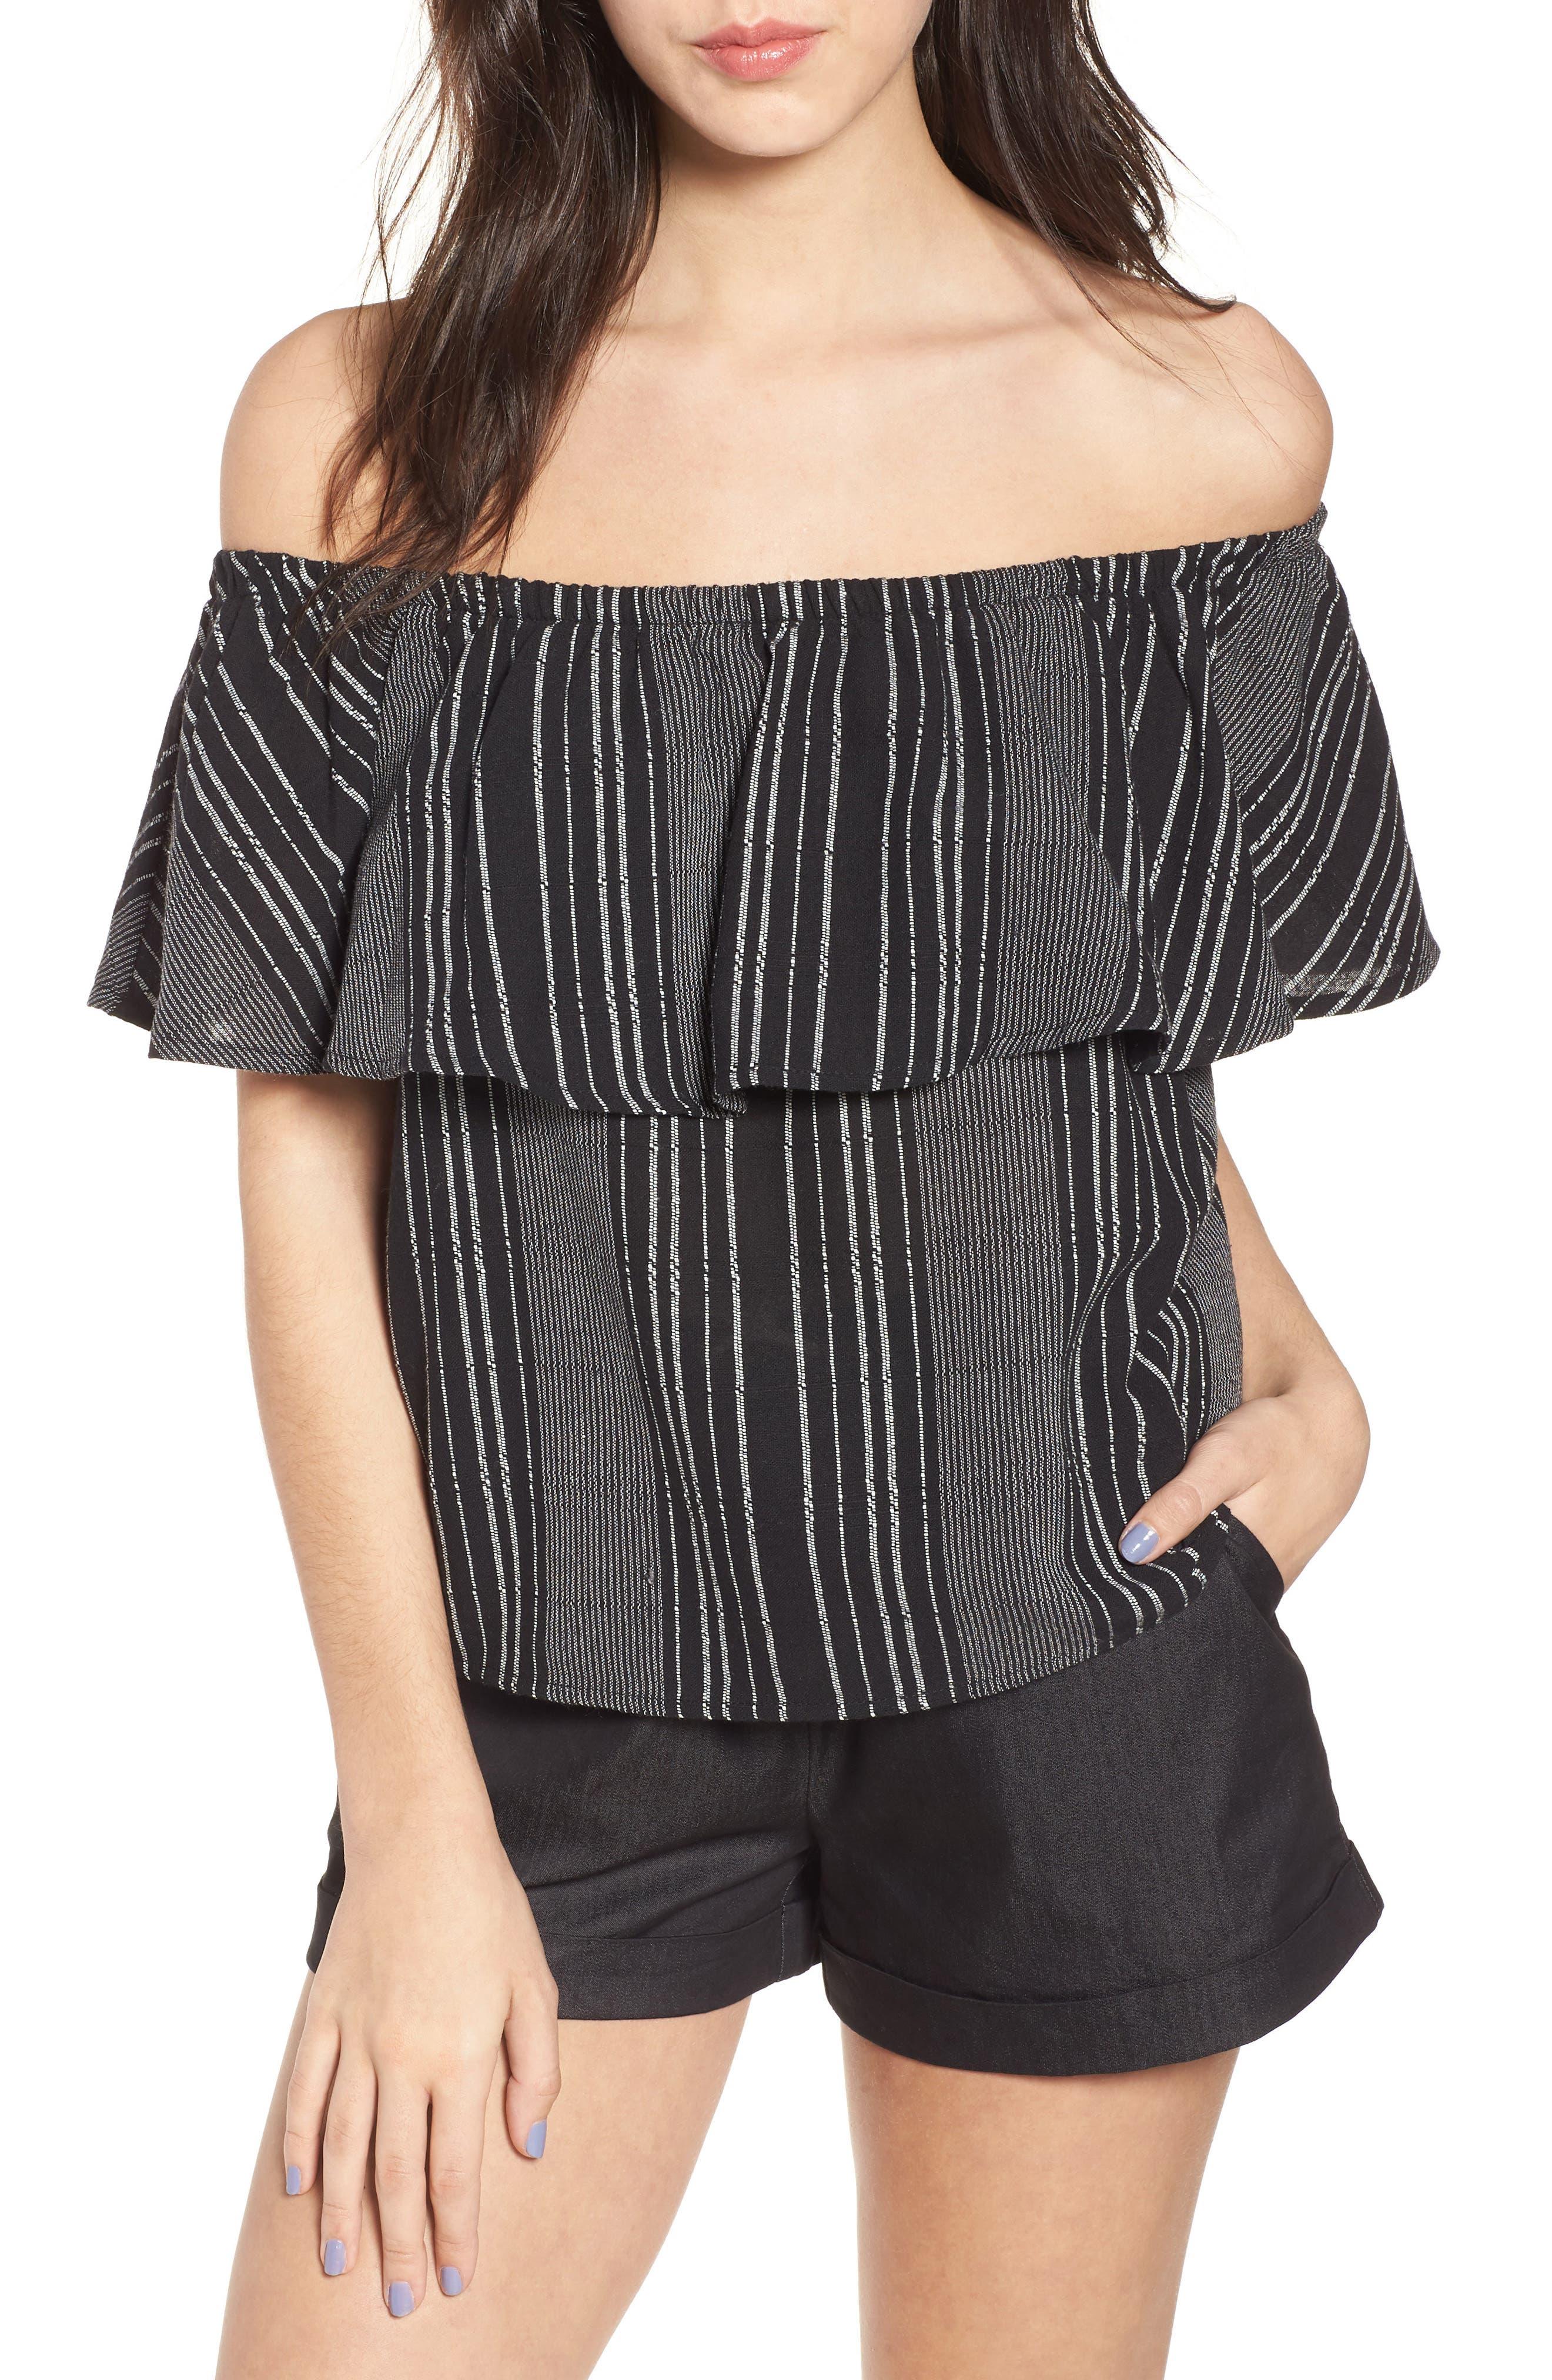 Lira Clothing Stella Stripe Off the Shoulder Top